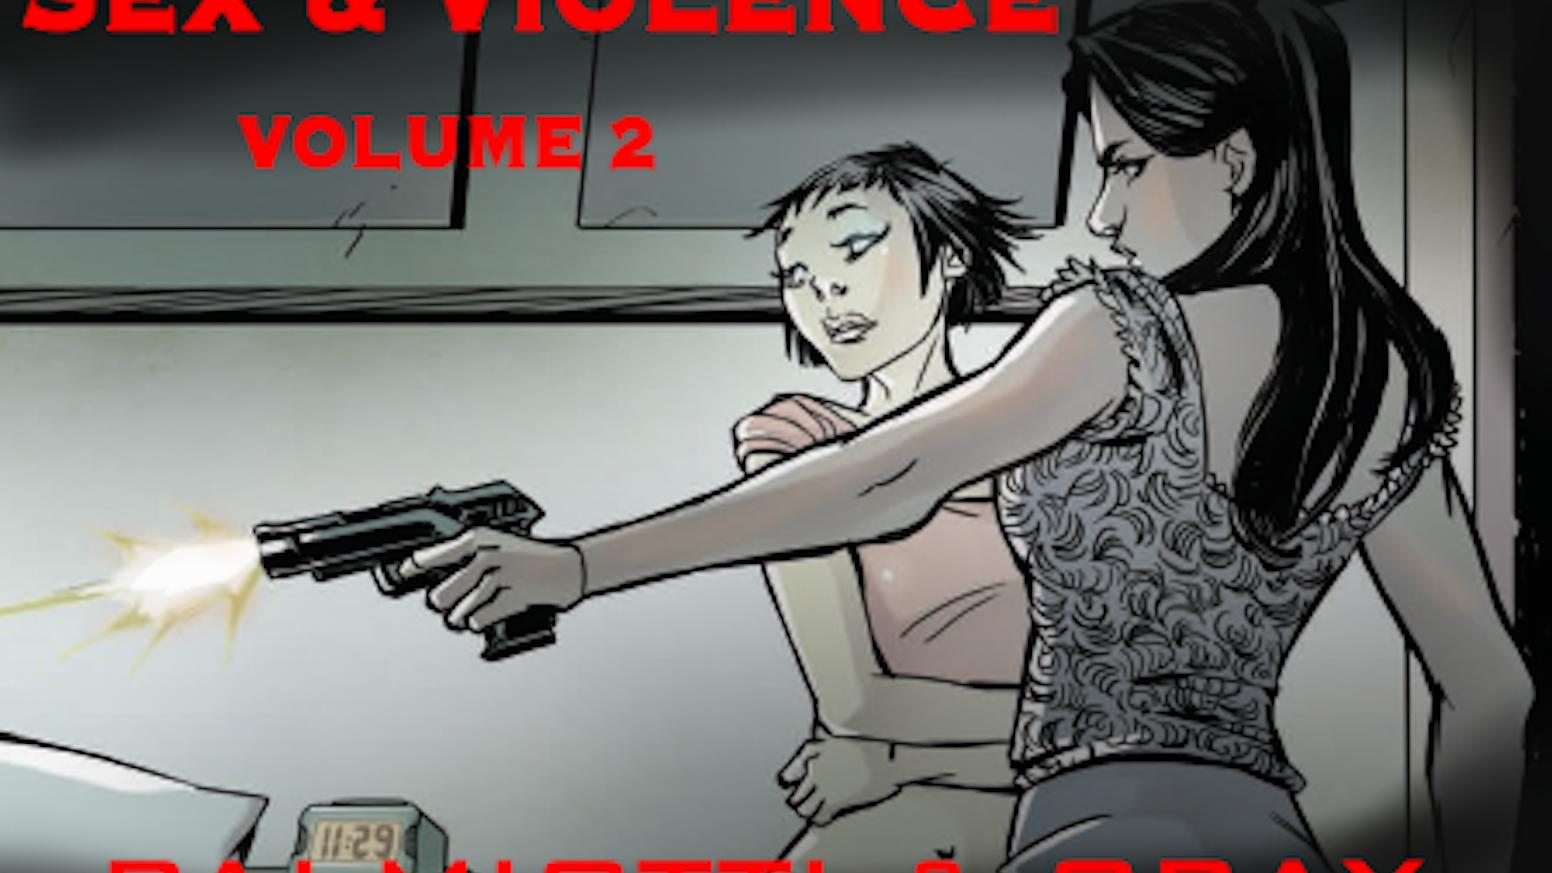 Amanda Page Sexy Movie sex and violence vol. 2jimmy palmiotti — kickstarter